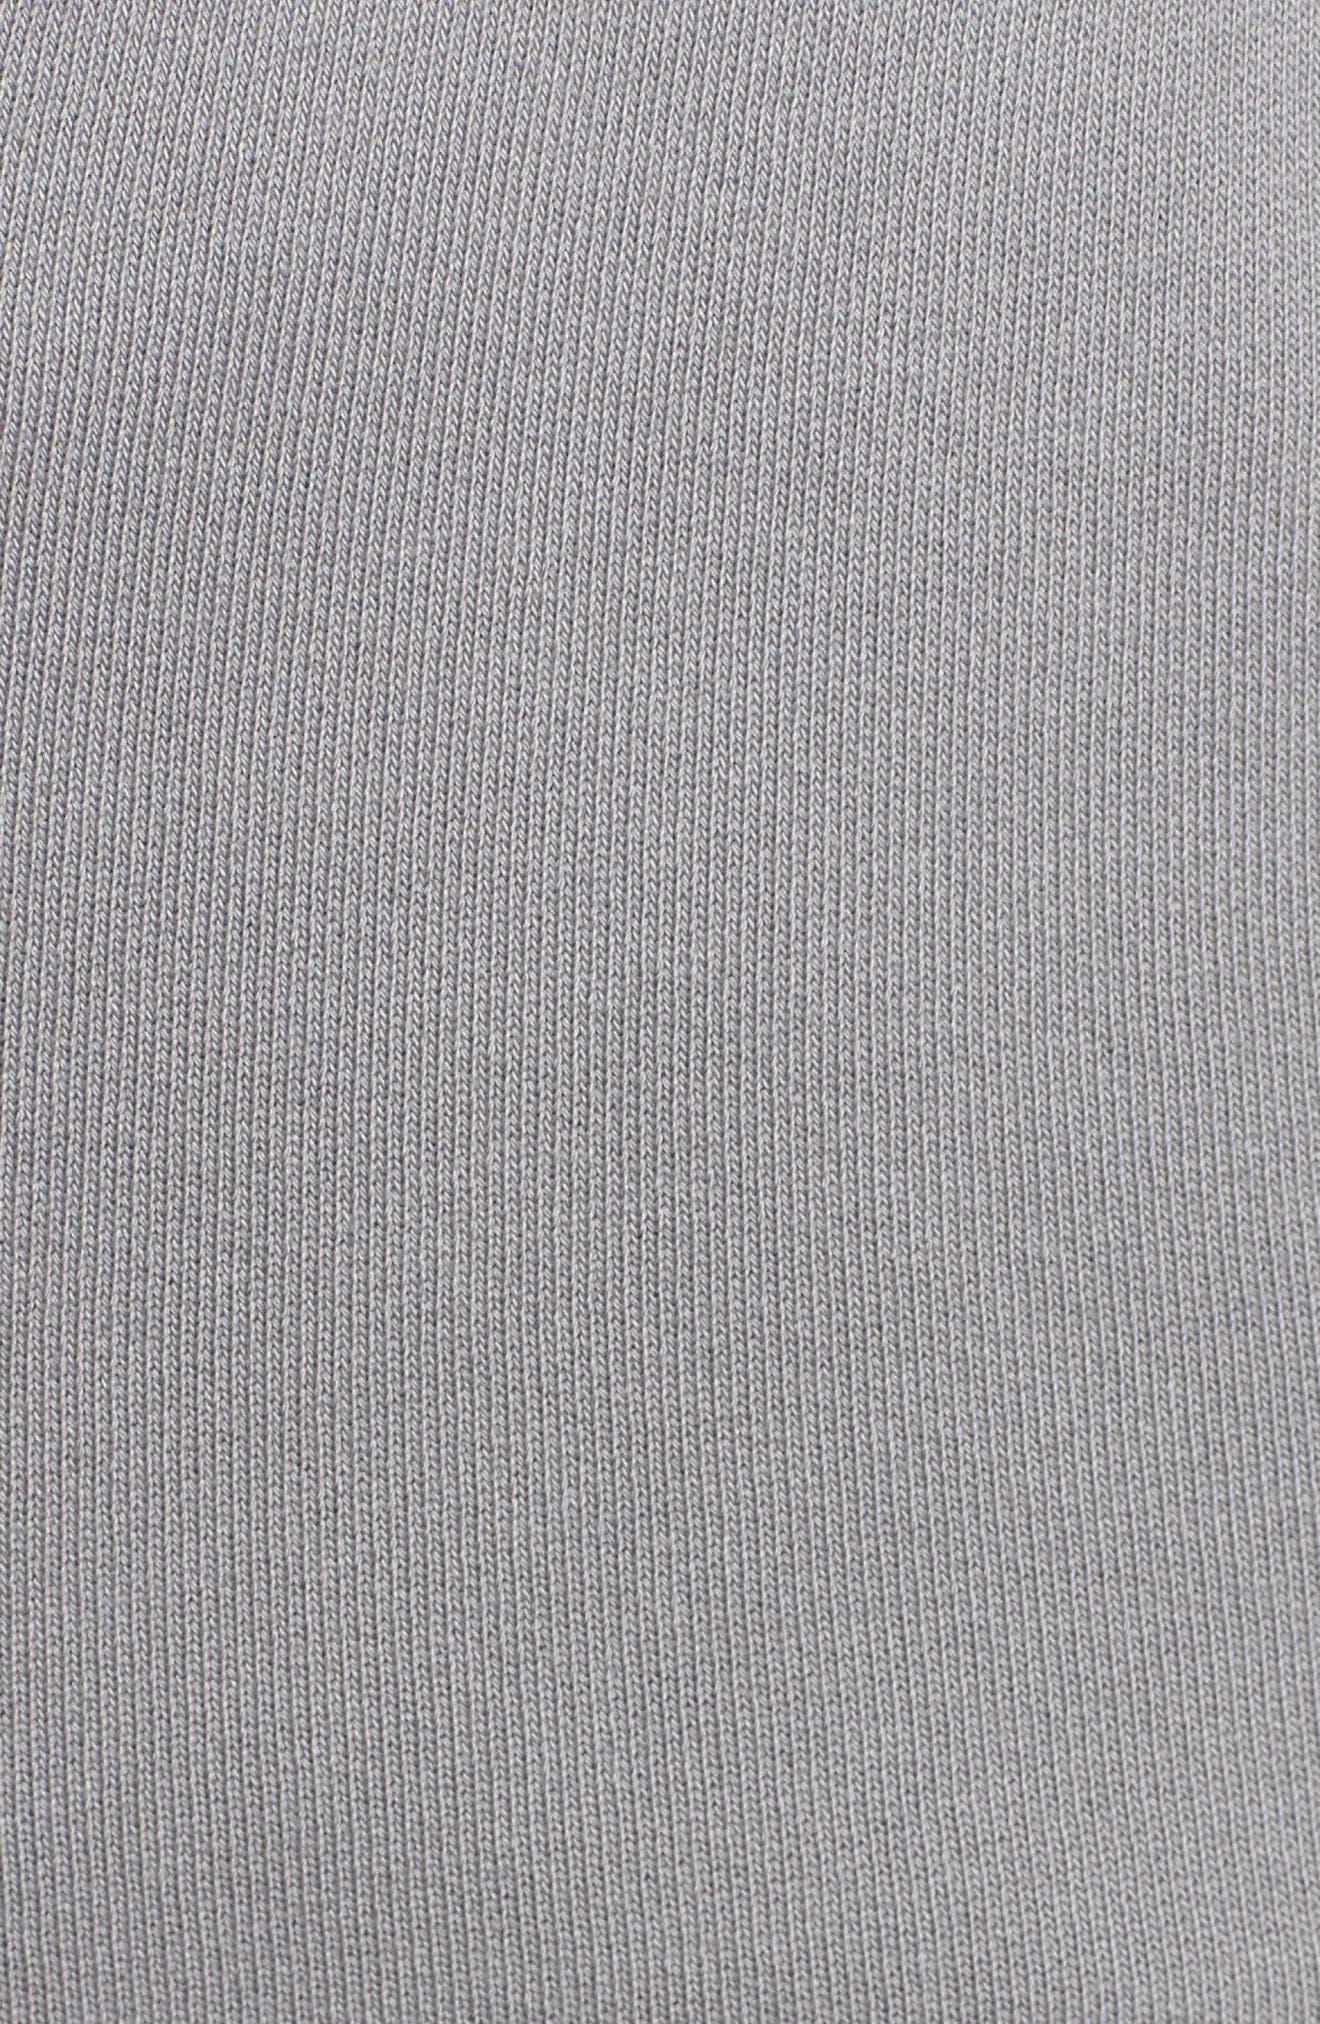 Tee Lab Raw Hem Crop Sweatpants,                             Alternate thumbnail 6, color,                             Shadow